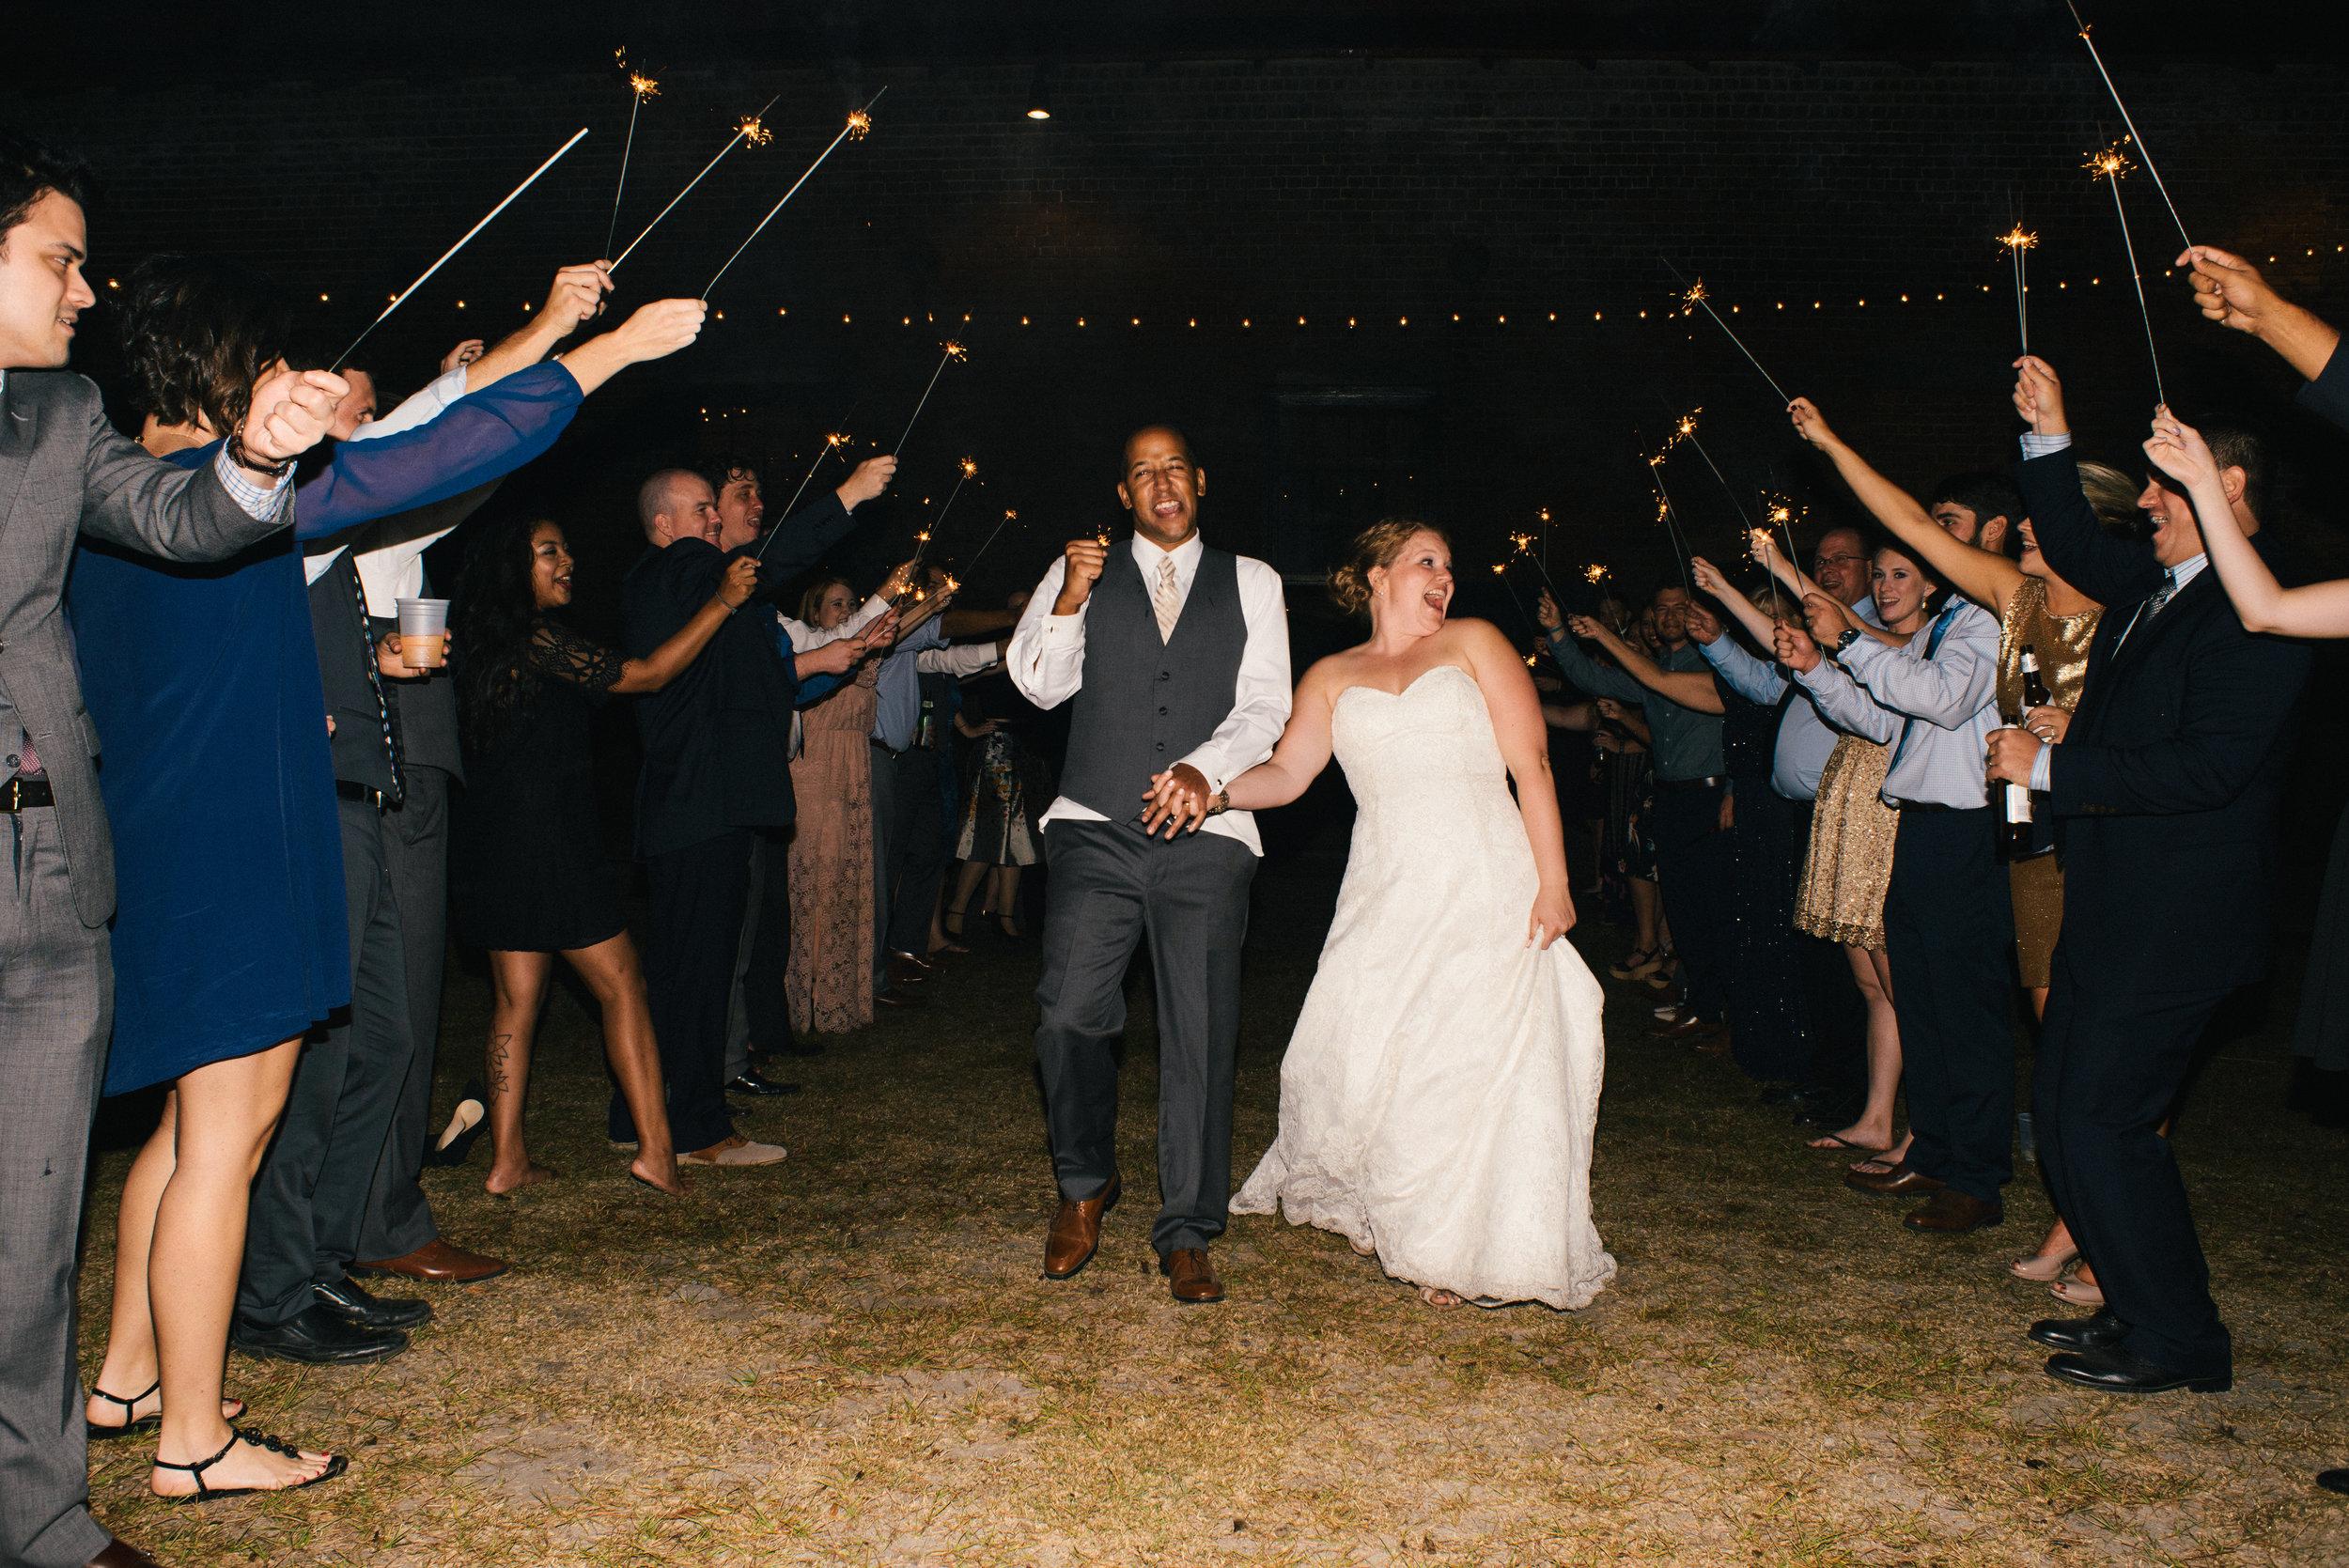 50-alternatives-to-a-sparkler-exit-at-your-wedding-.jpg